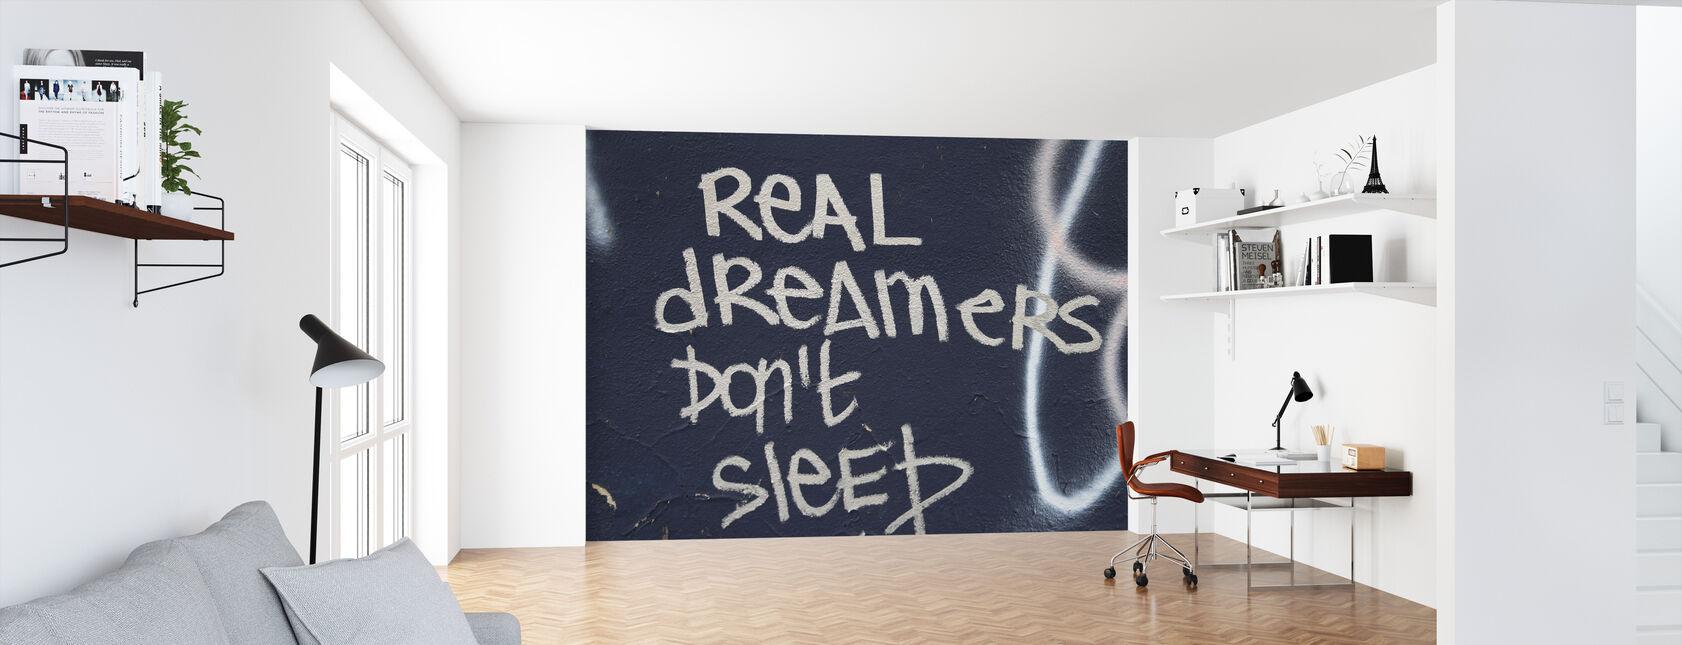 Graffiti i sztuka uliczna